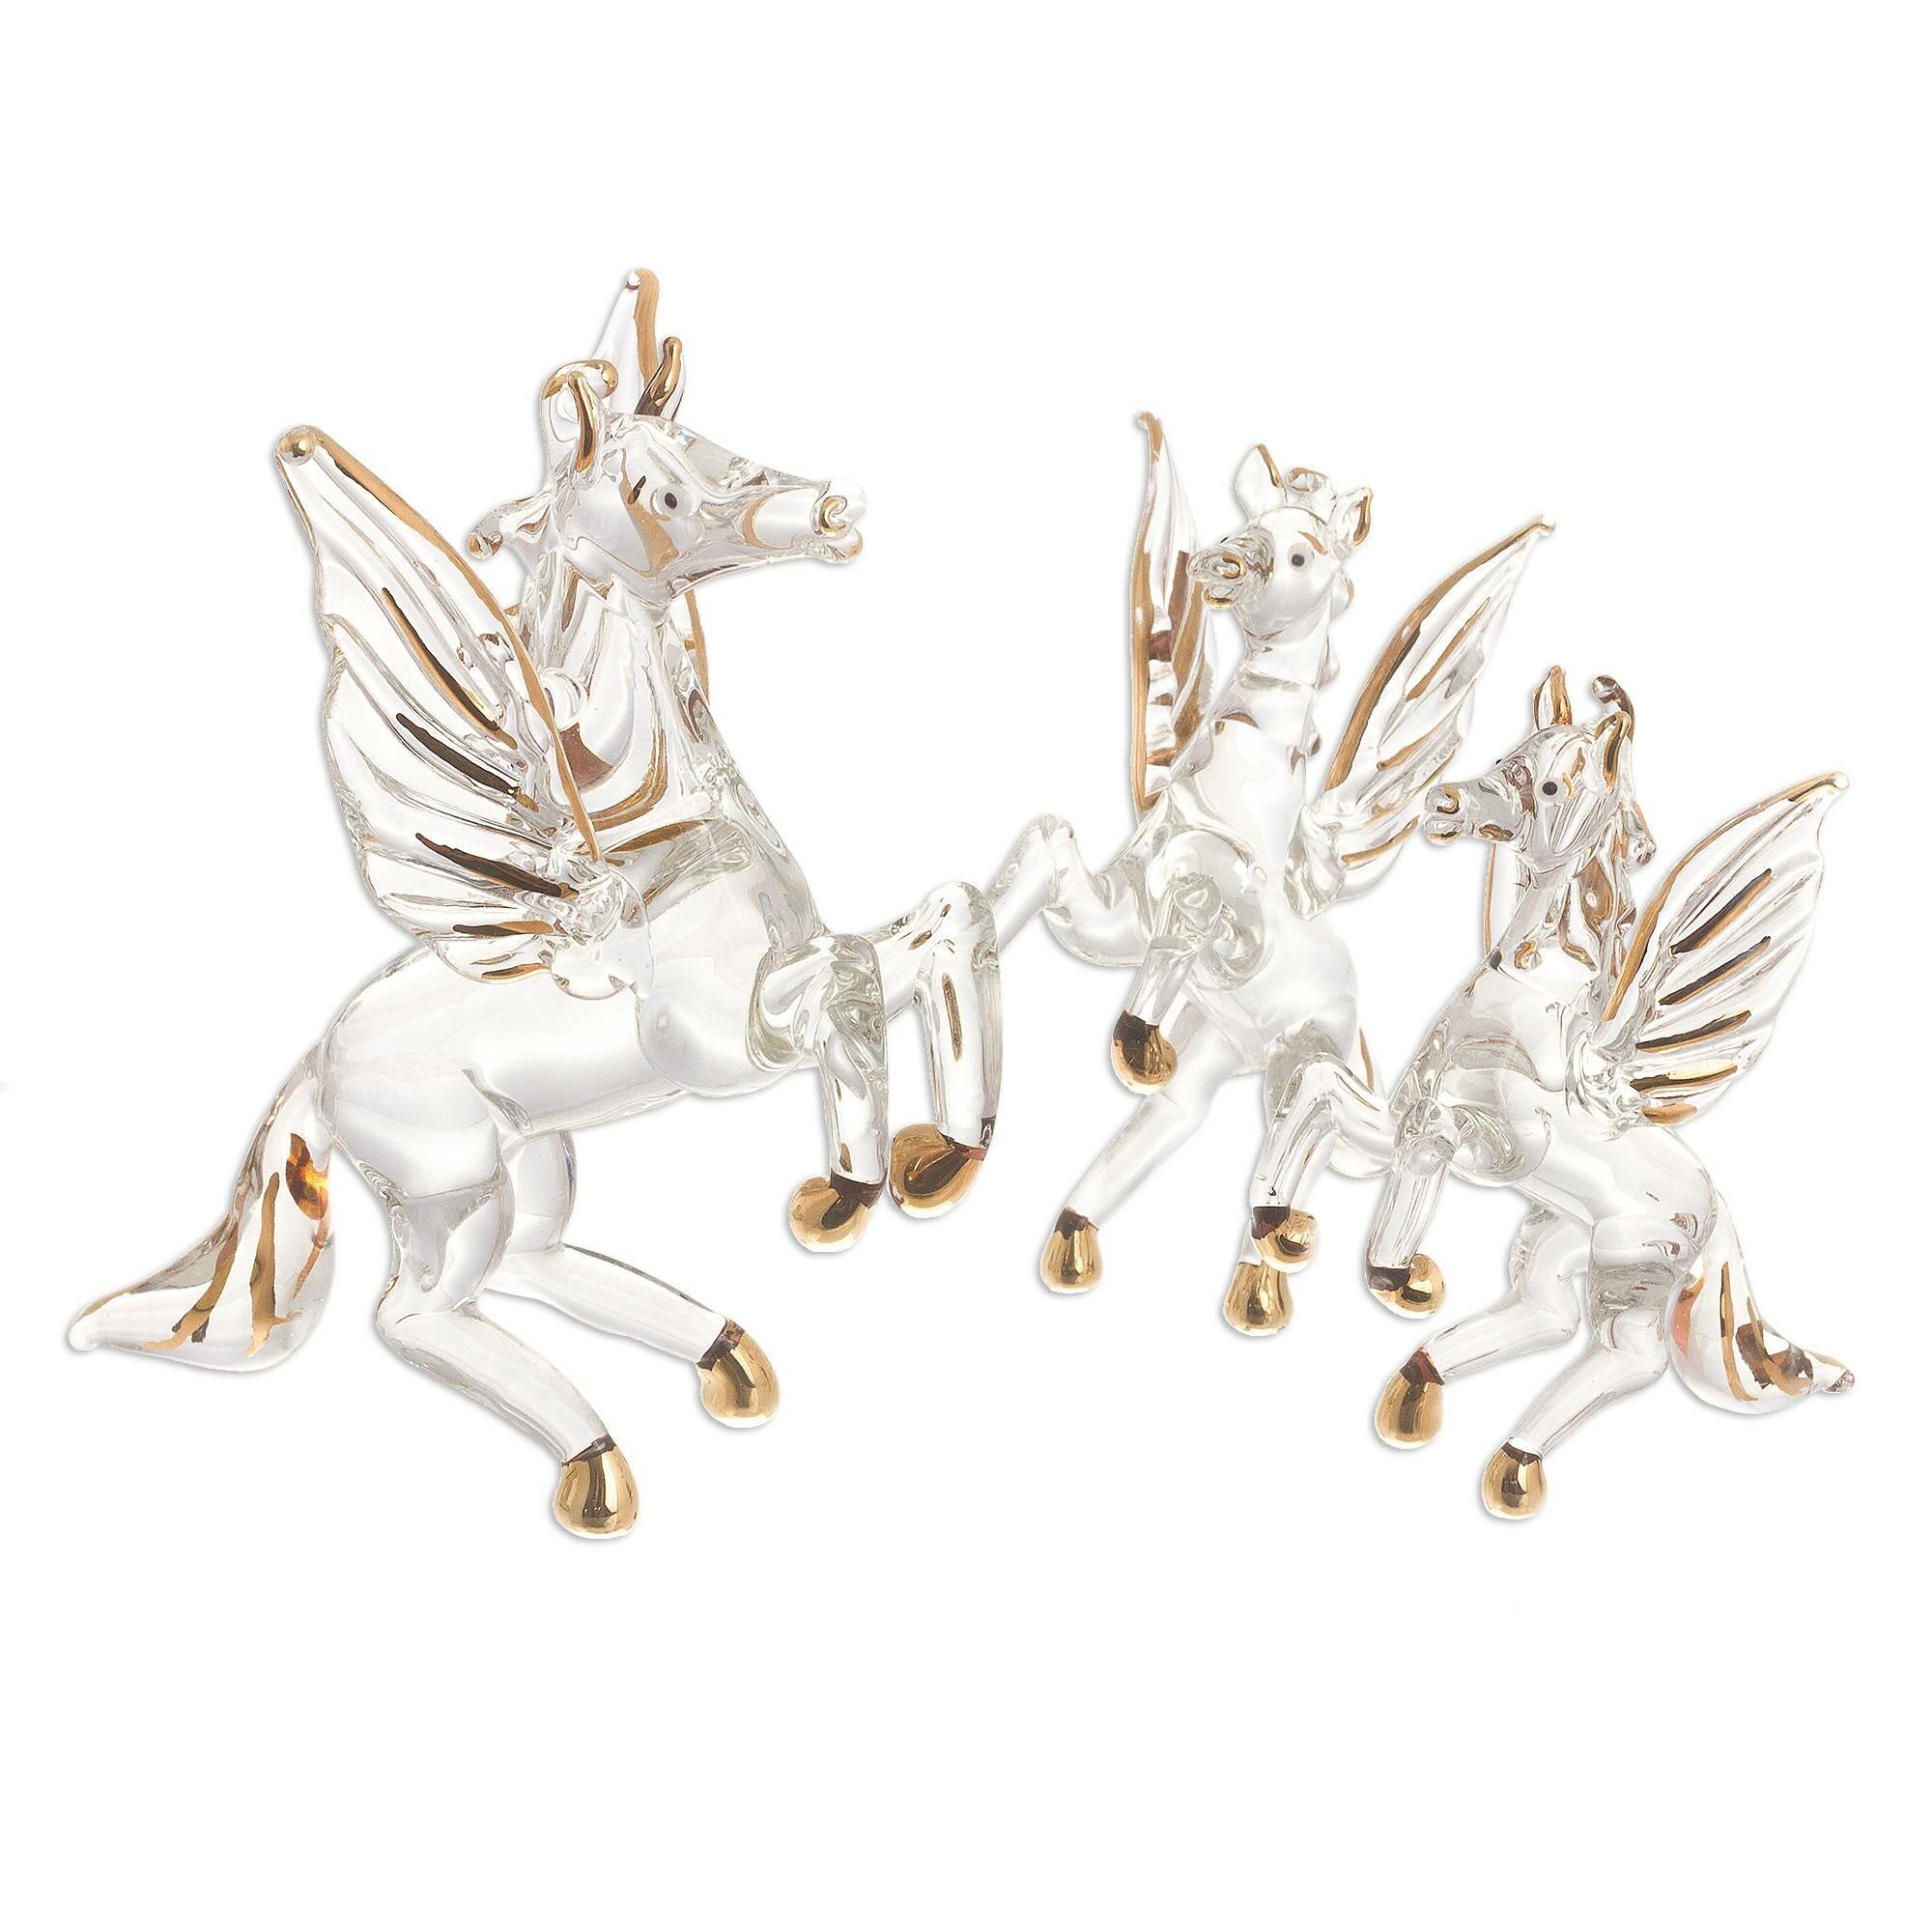 House Of Hampton 3 Piece Paras Rearing Pegasus Gilded Glass Figurines Set Wayfair